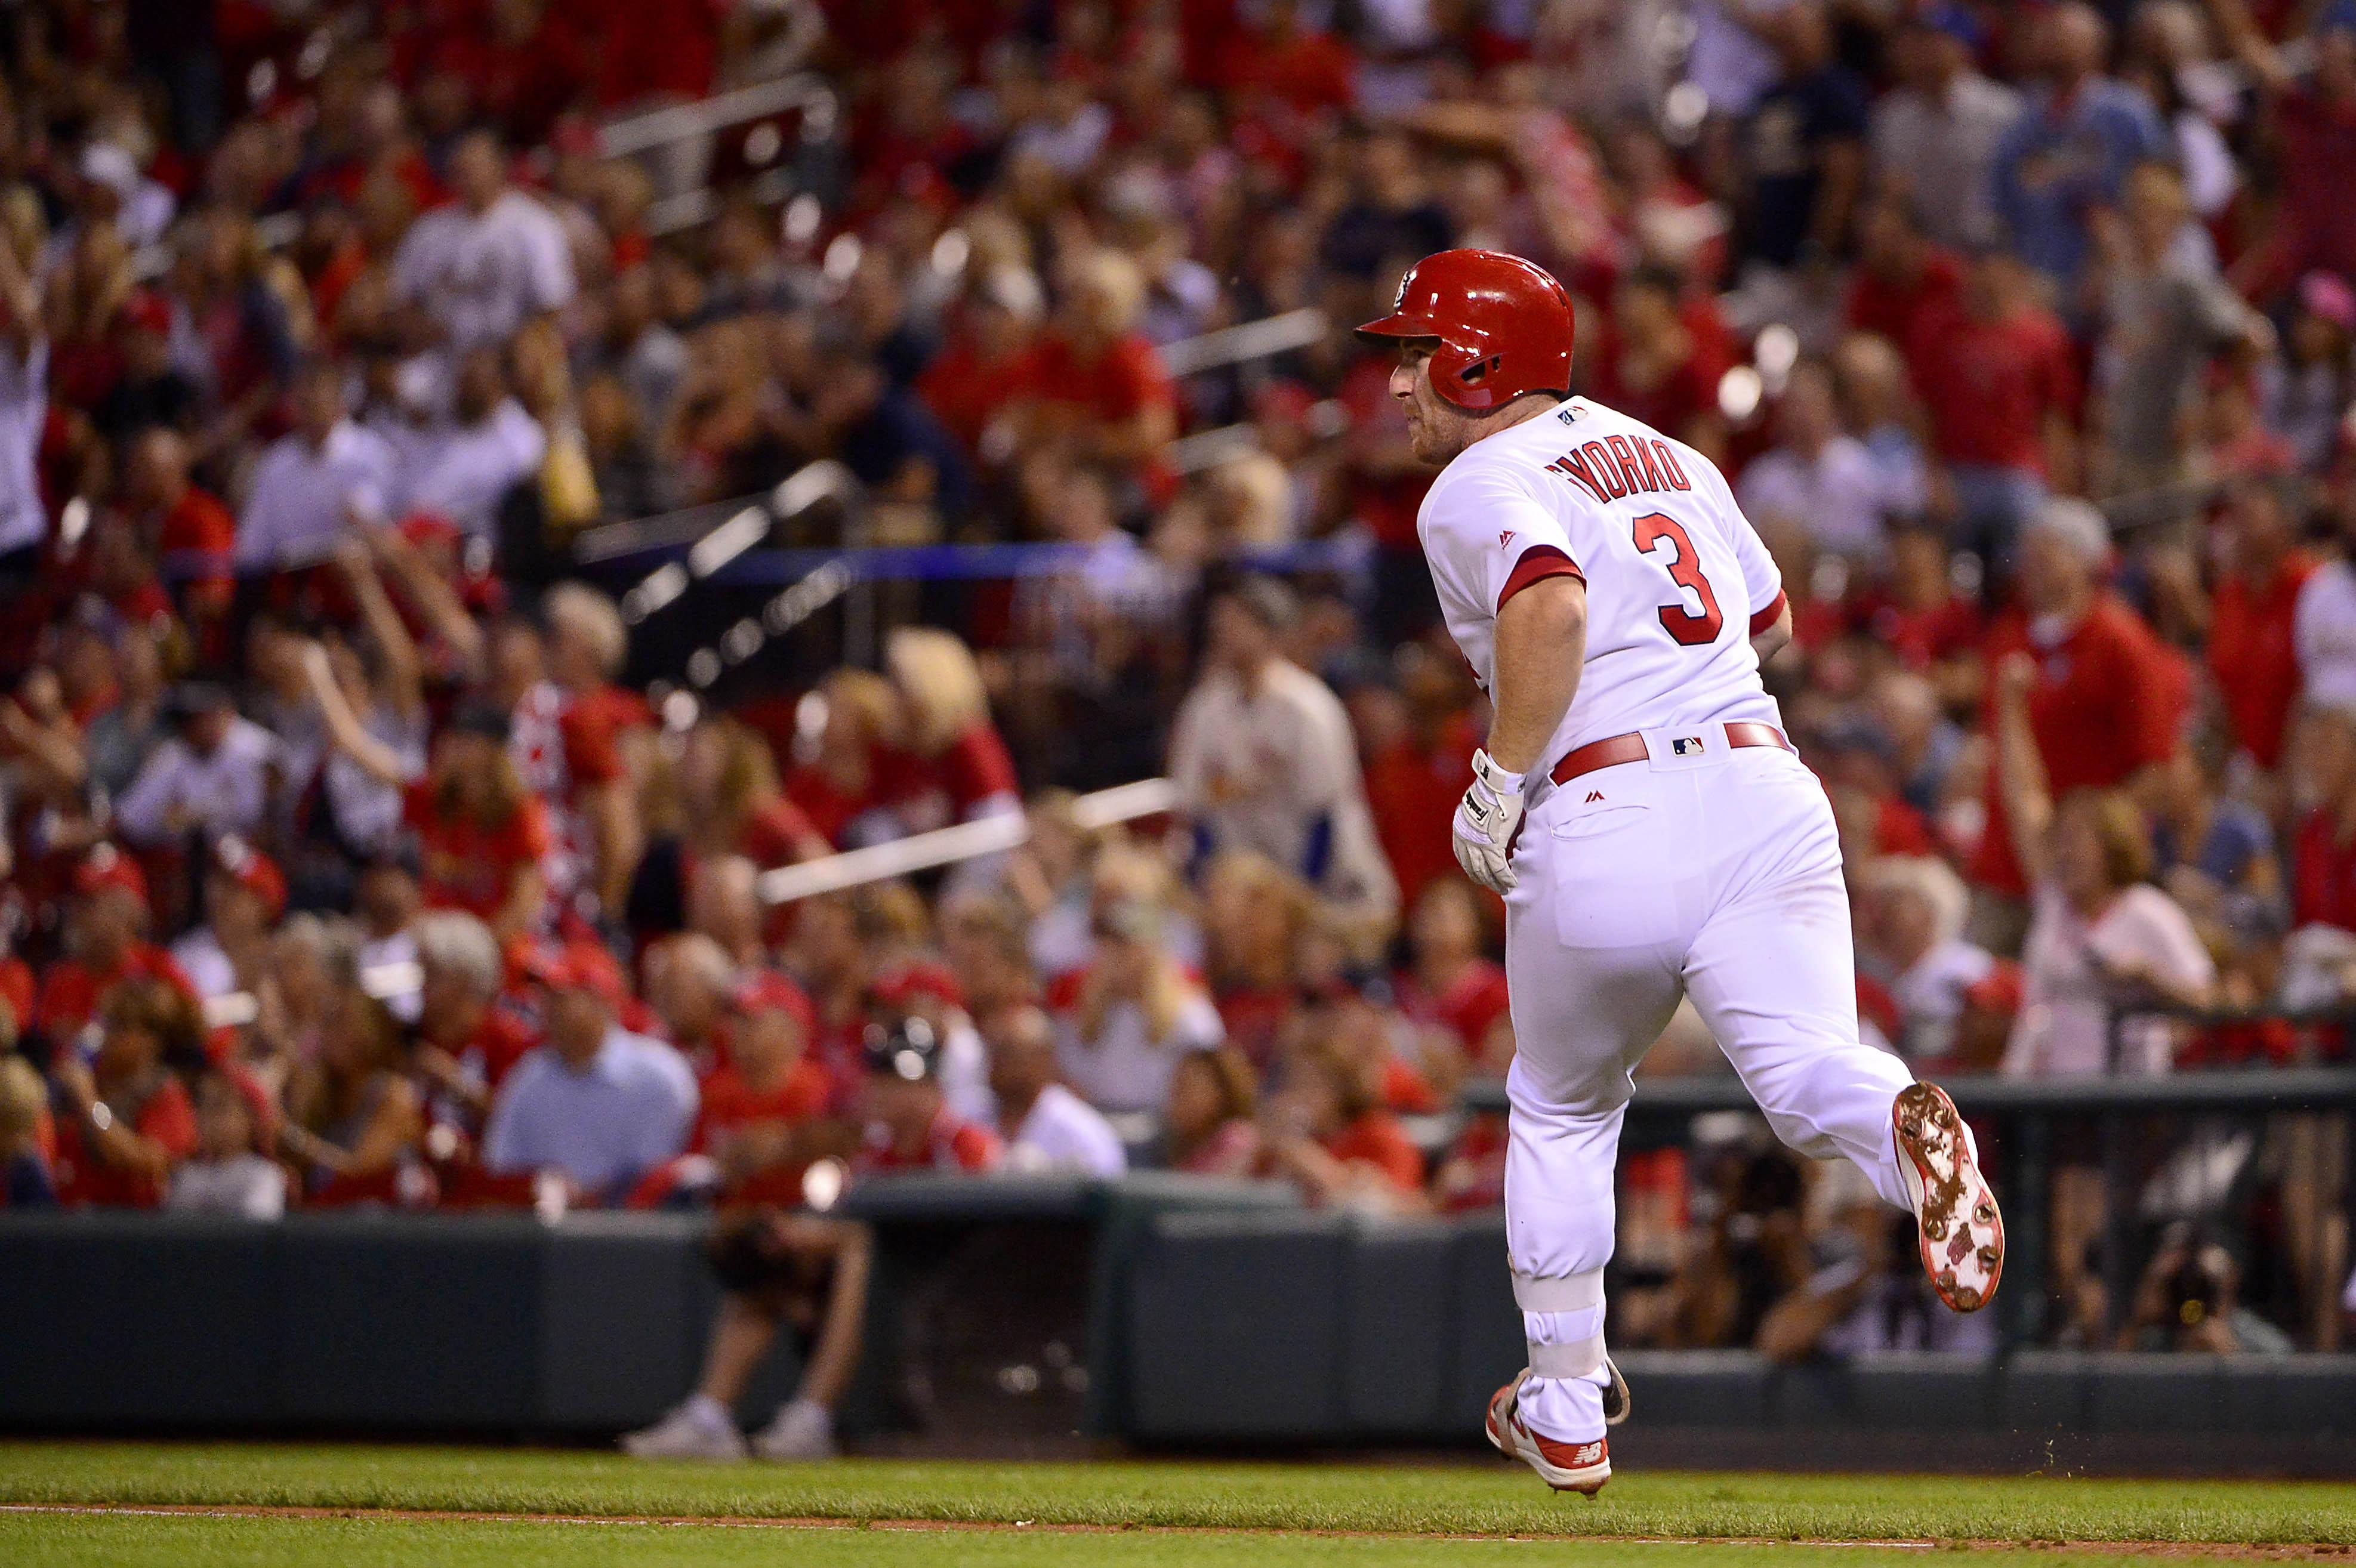 MLB: San Diego Padres at St. Louis Cardinals